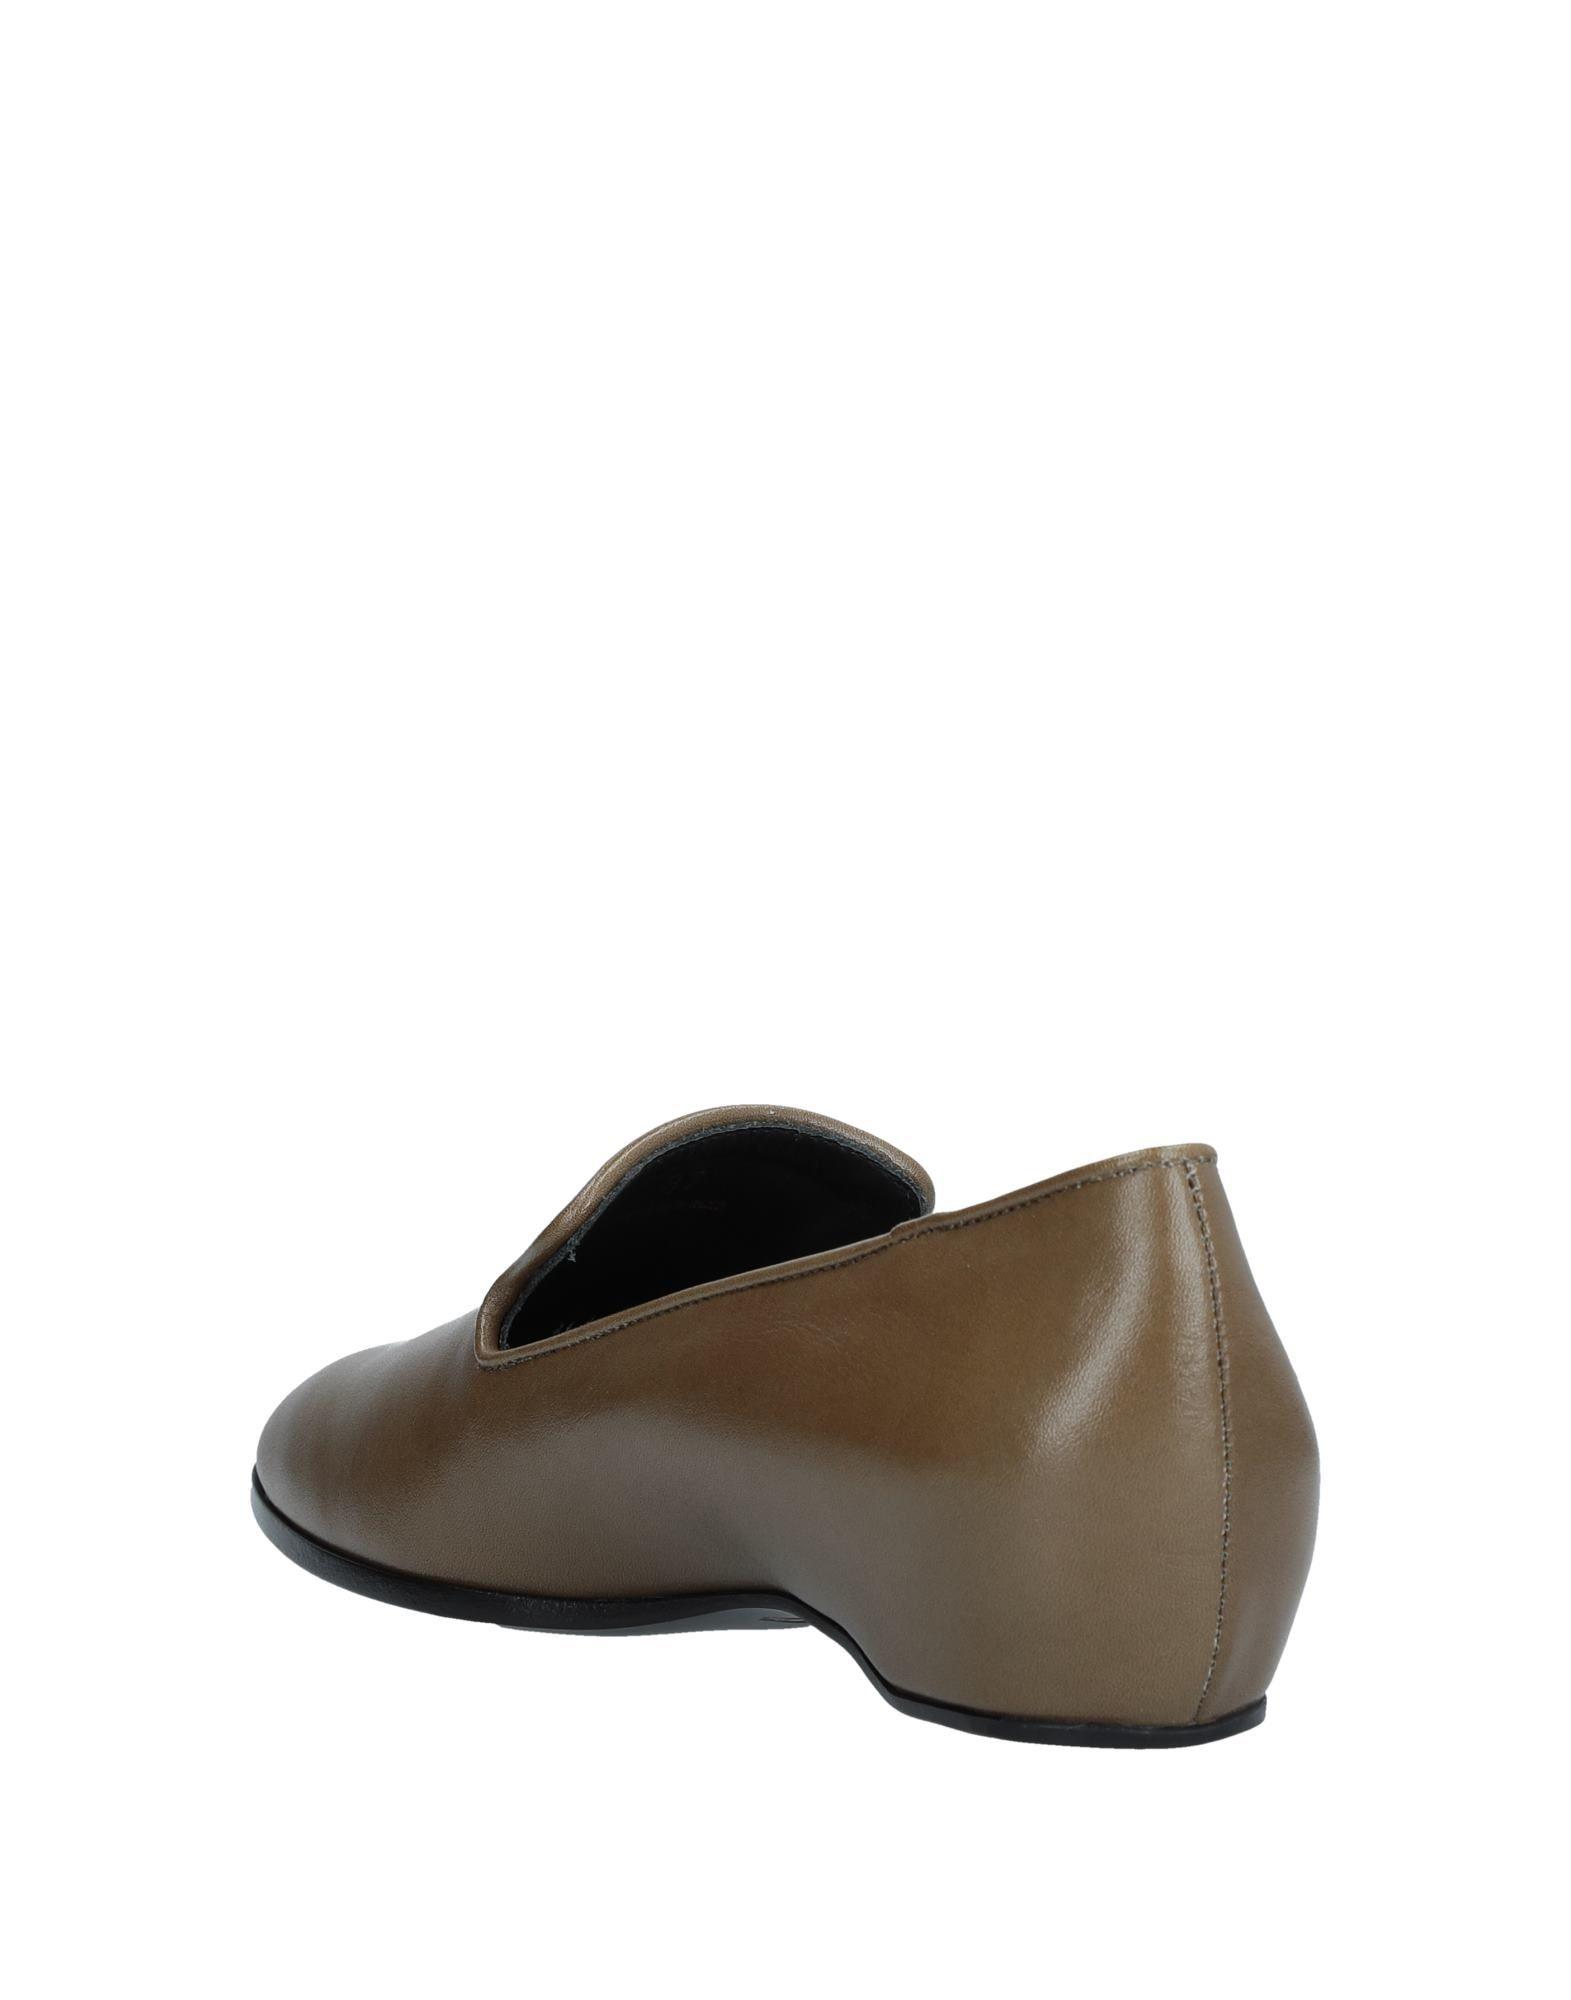 Tod's Mokassins Damen  11541229AC Schuhe Heiße Schuhe 11541229AC 367853